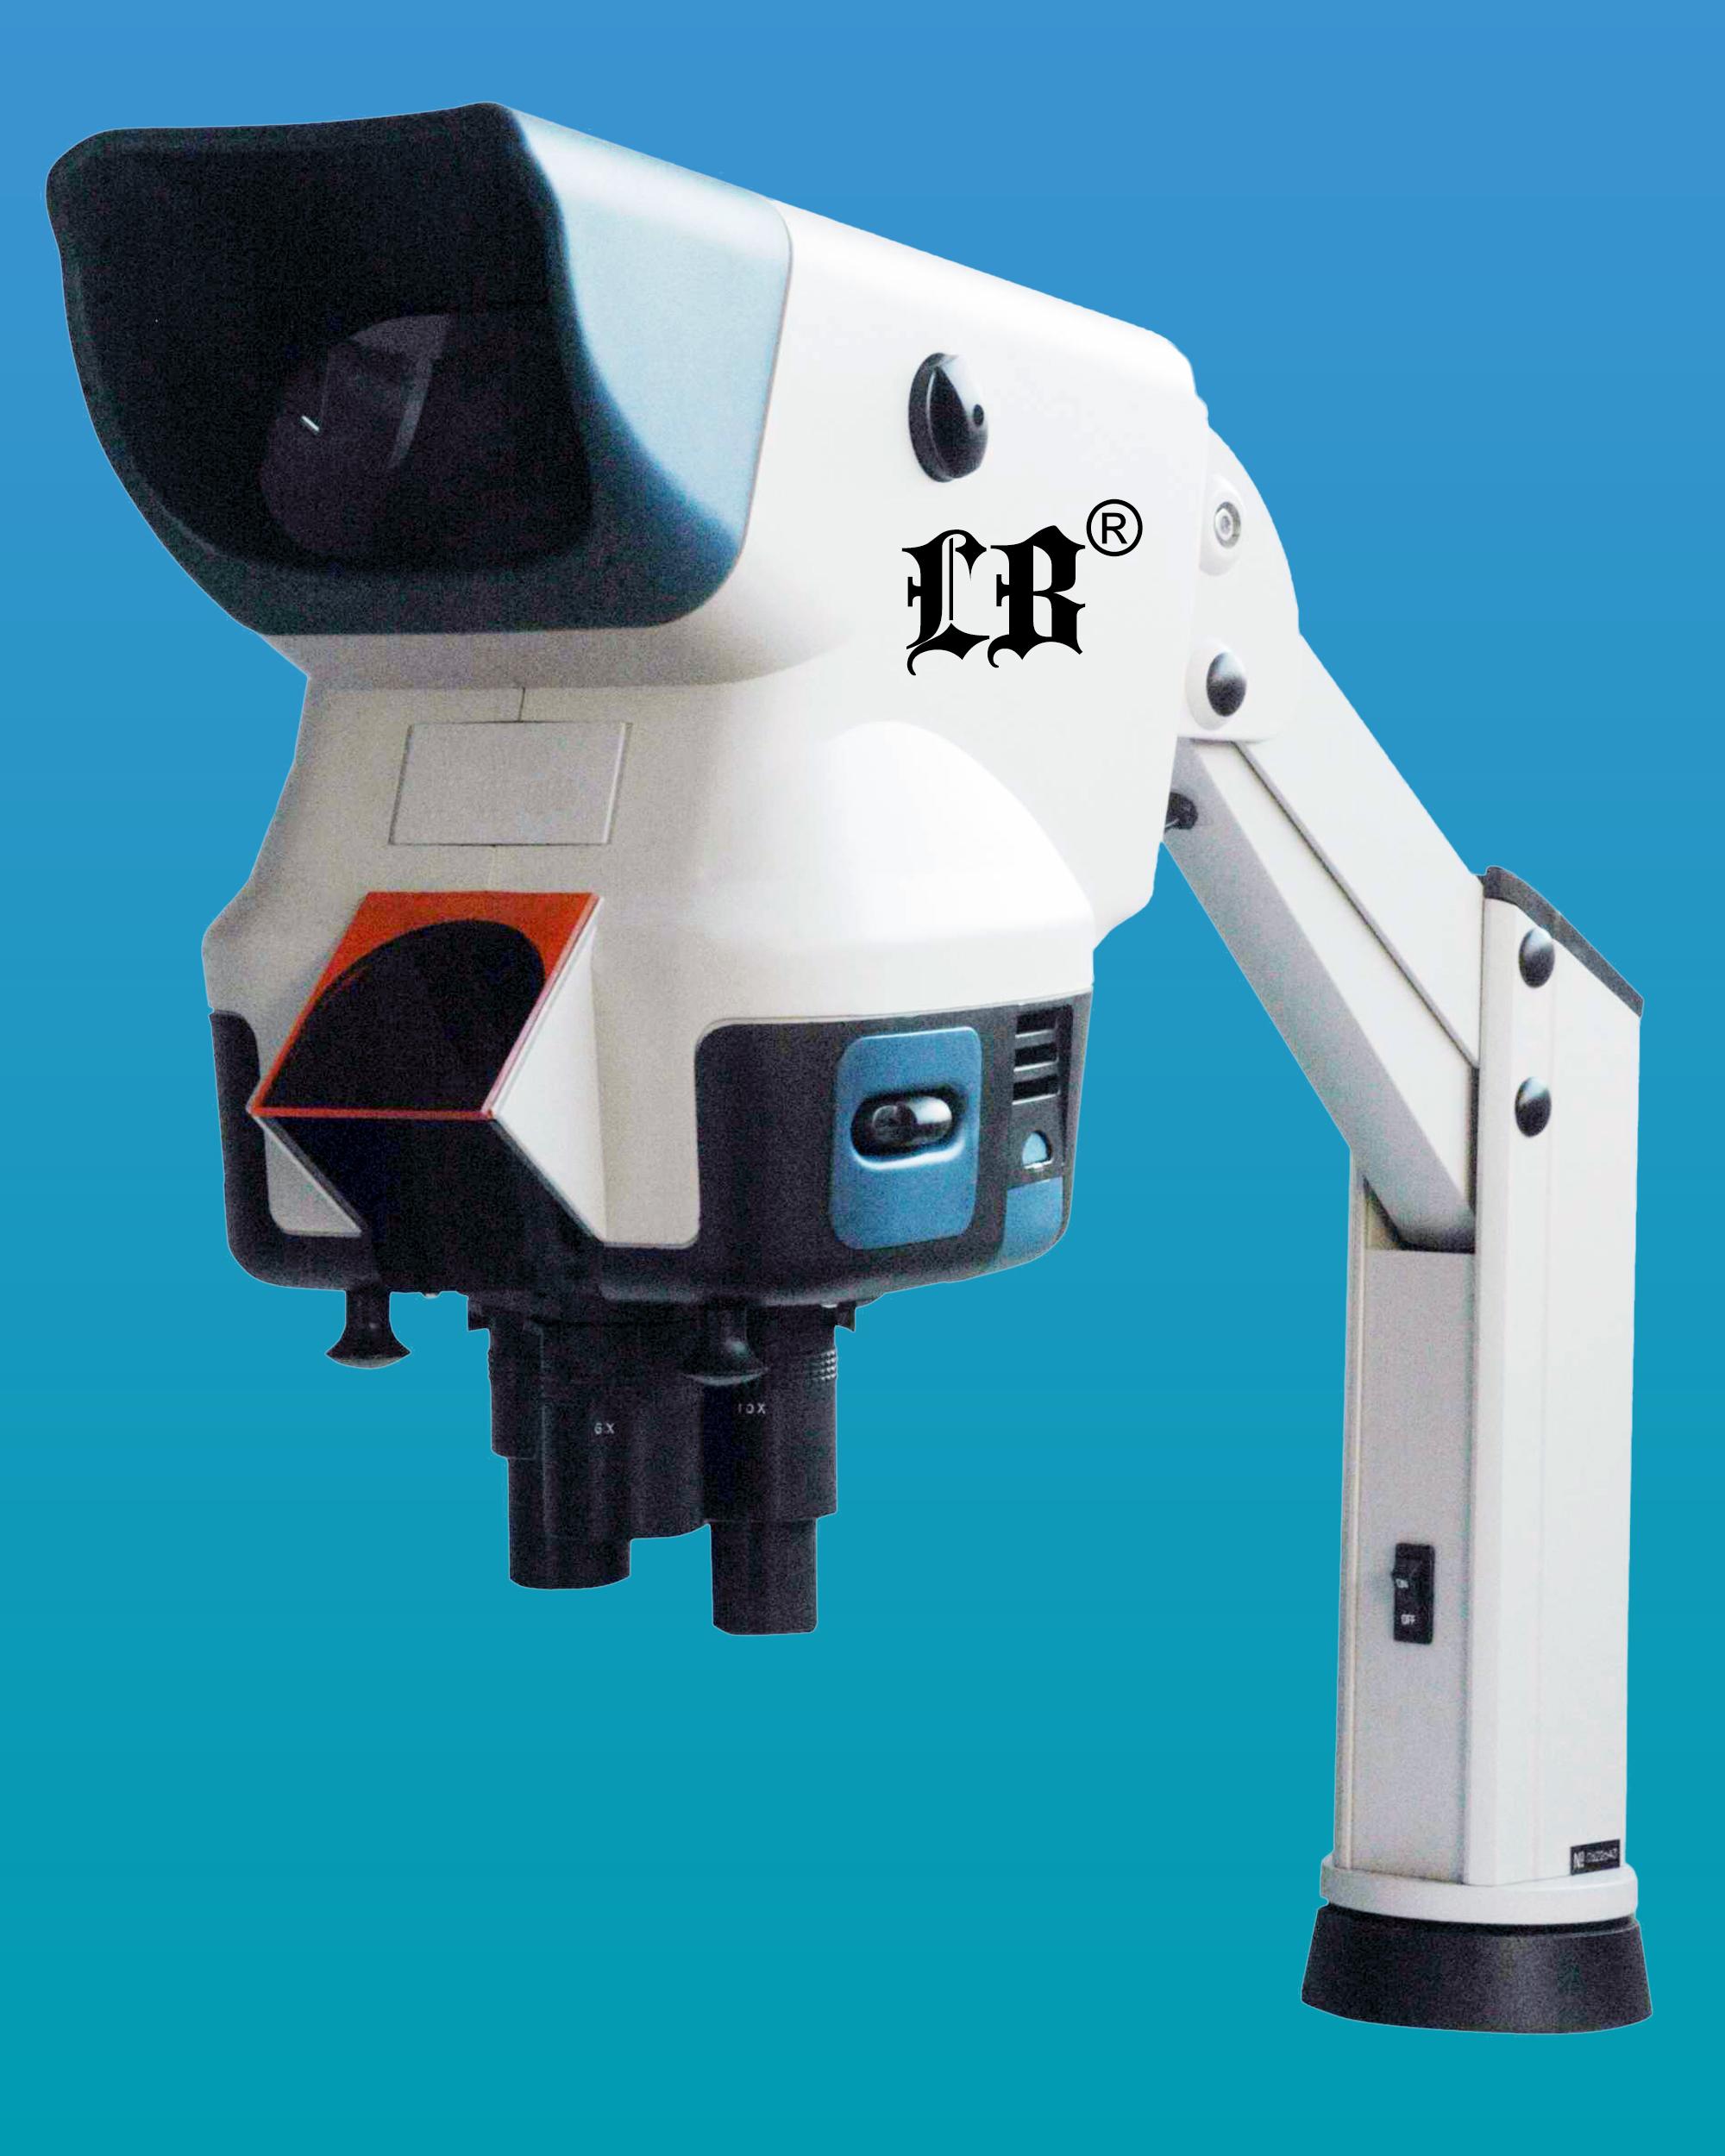 [LB-372] Wide Field Digital Zoom Stereo Microscope w/ Universal St&